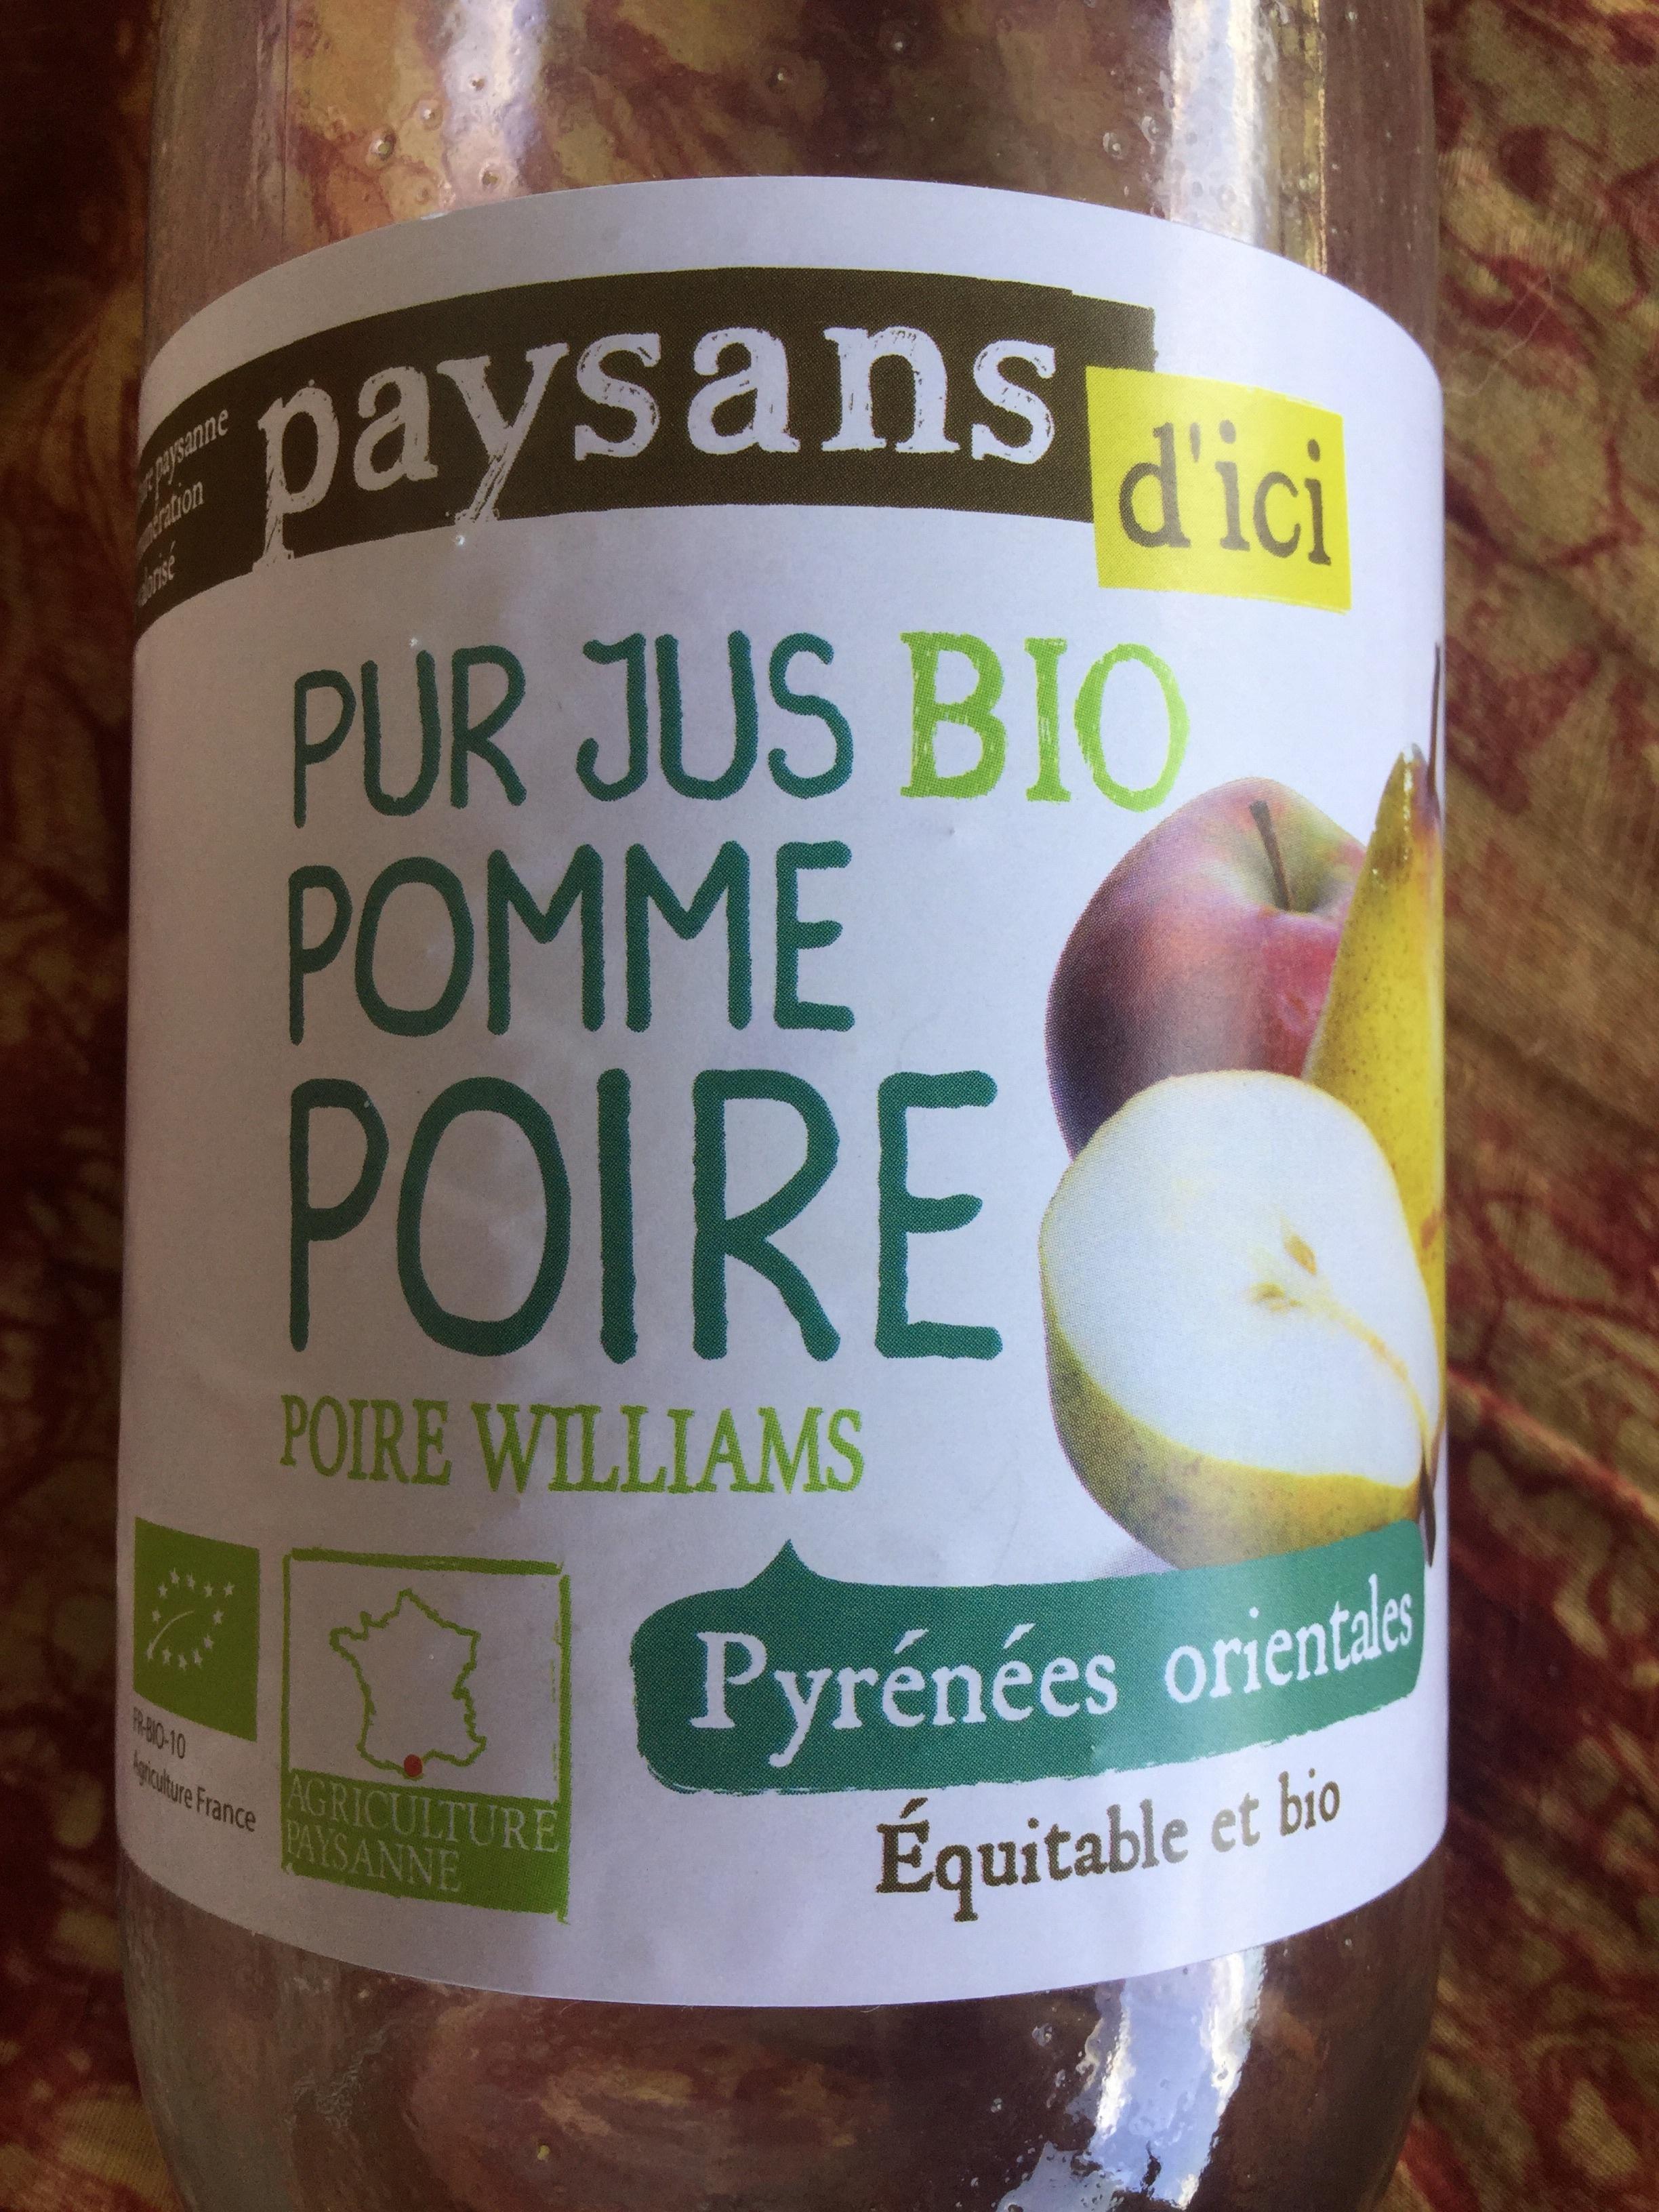 Pur jus bio pomme poire - Prodotto - fr